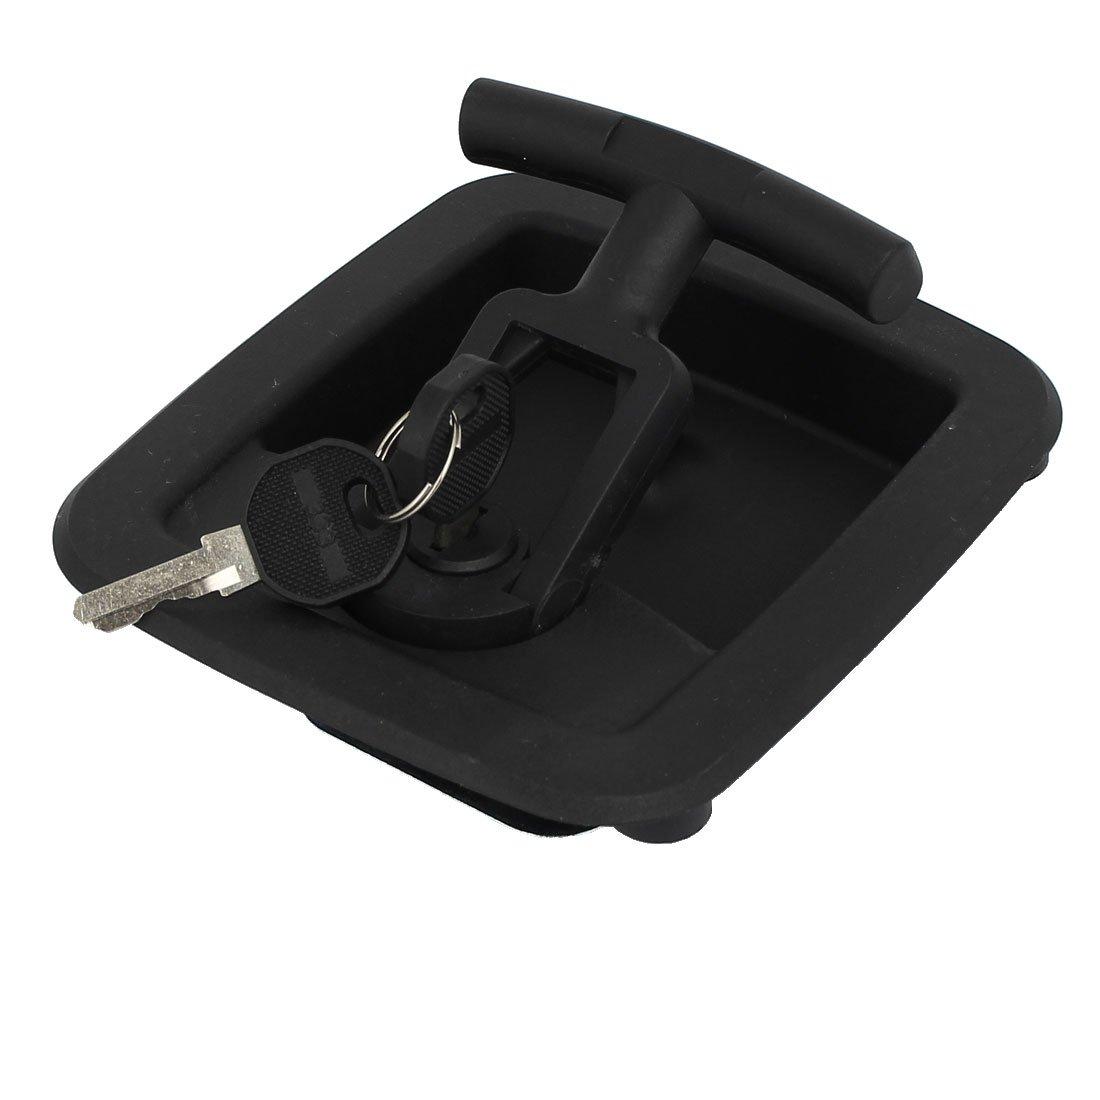 uxcell Door Toolbox Plastic Folding T-handle Security Latch Lock Locker Black w 2 Keys by uxcell (Image #2)